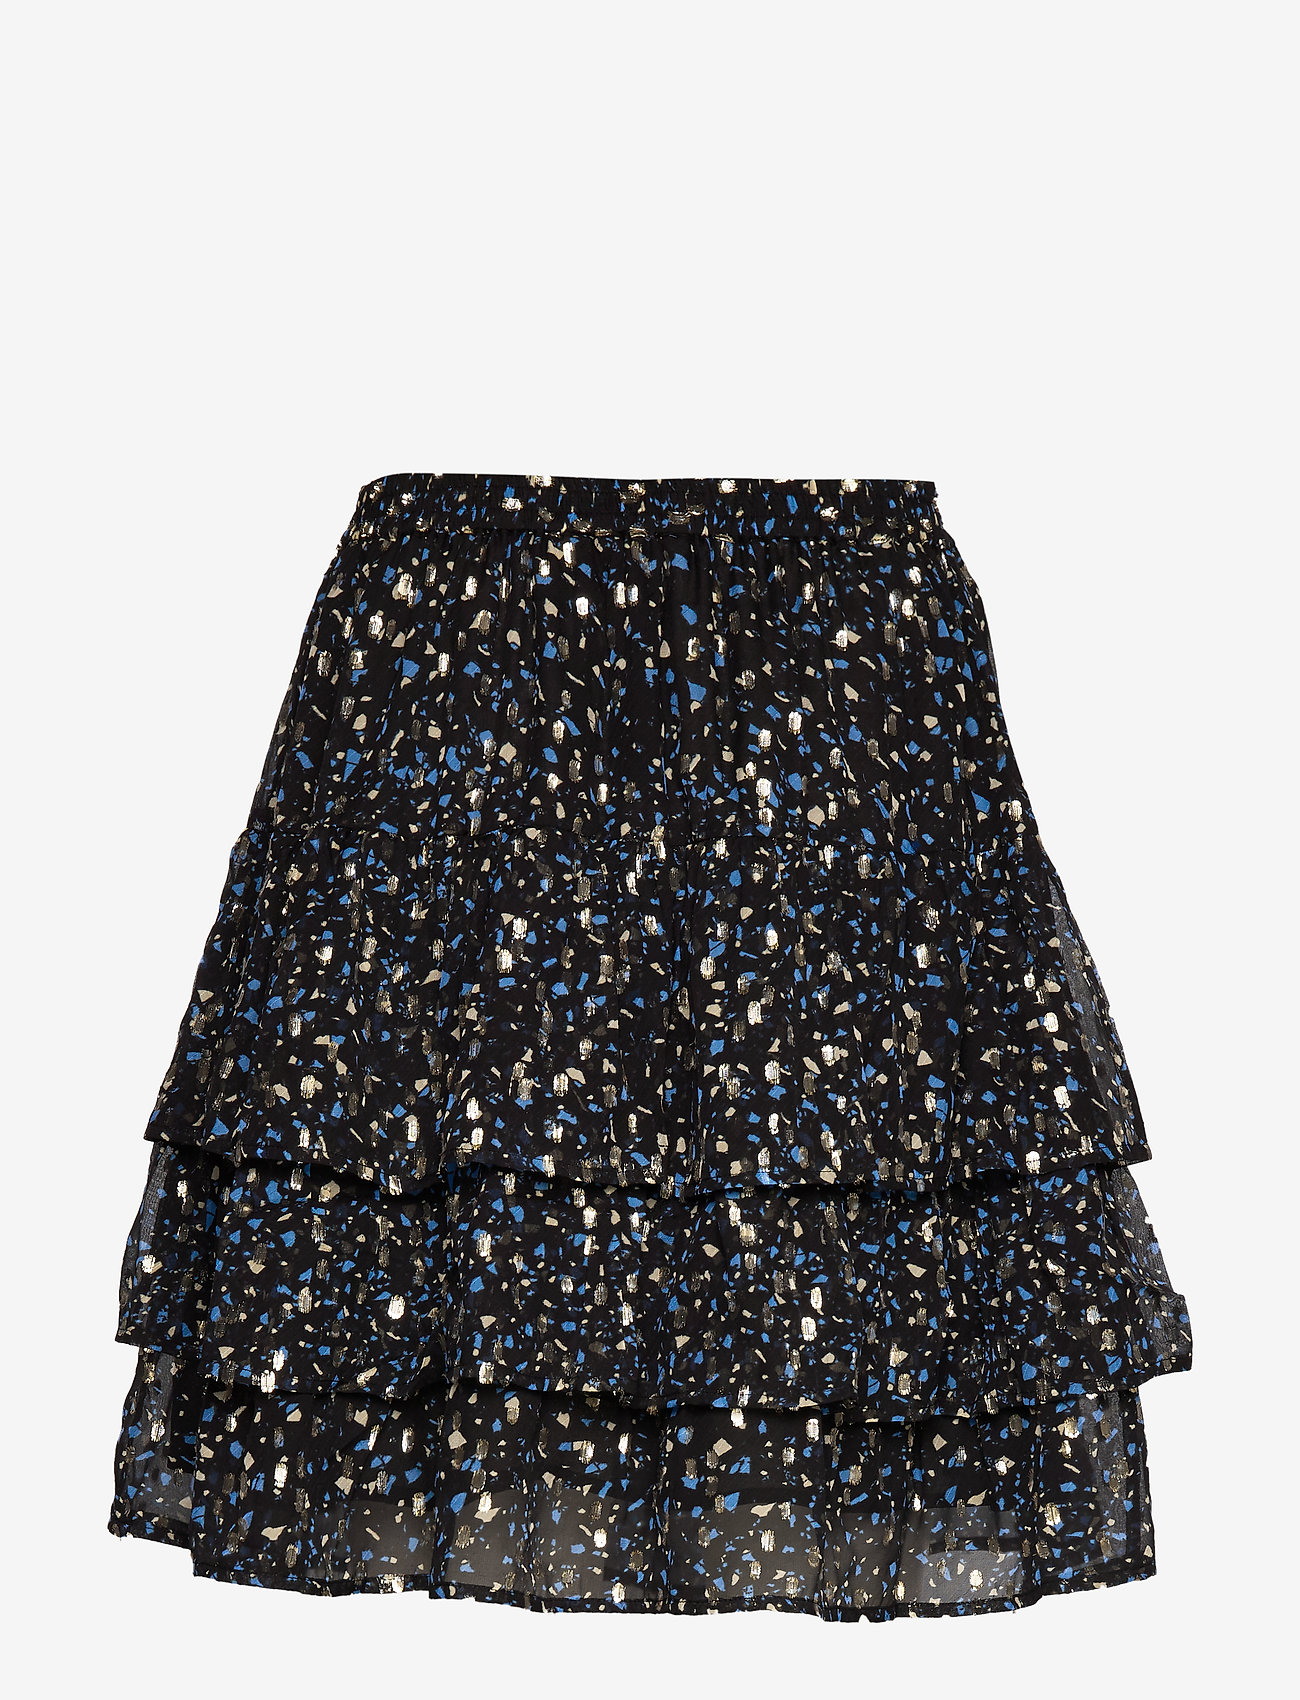 Stella Nova Nist - Spódnice SPARKLES IN THE NIGHT - Kobiety Odzież.